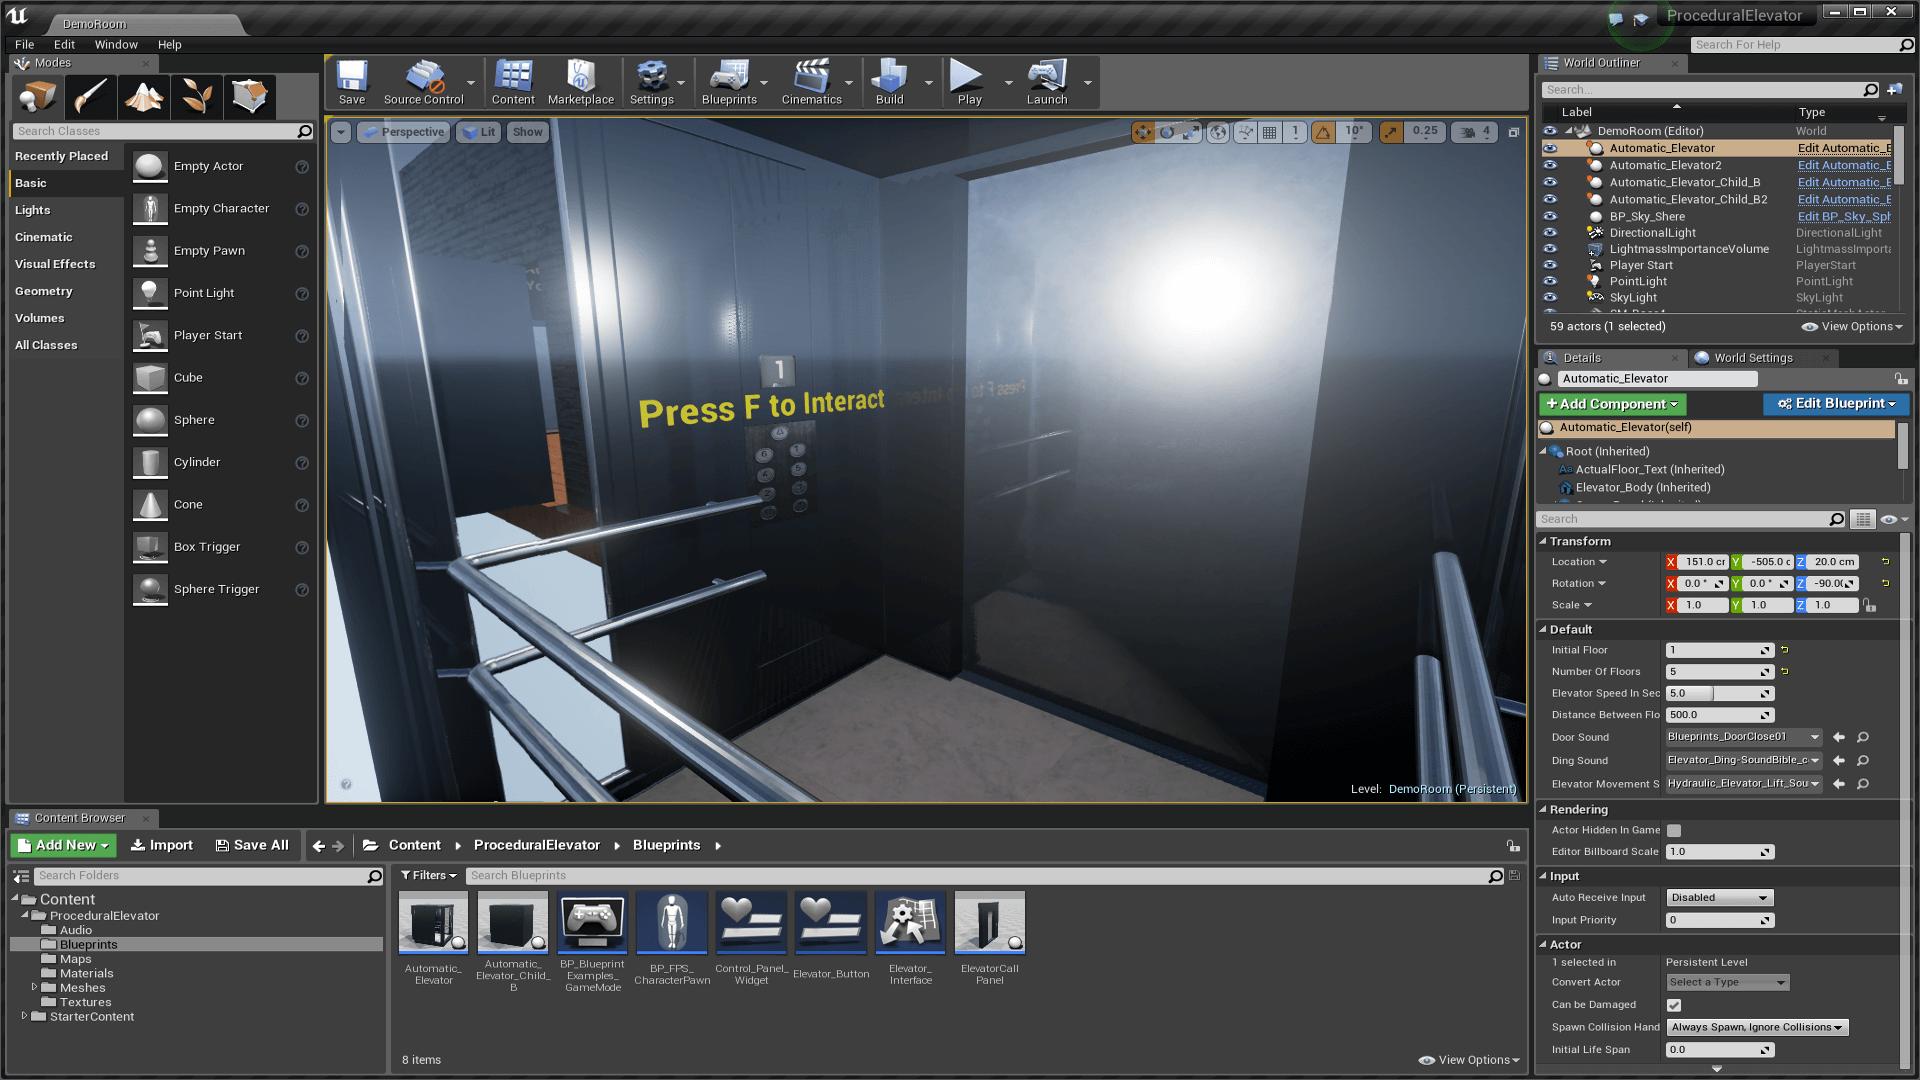 Procedural Elevator by Balázs Viktor in Blueprints - UE4 Marketplace